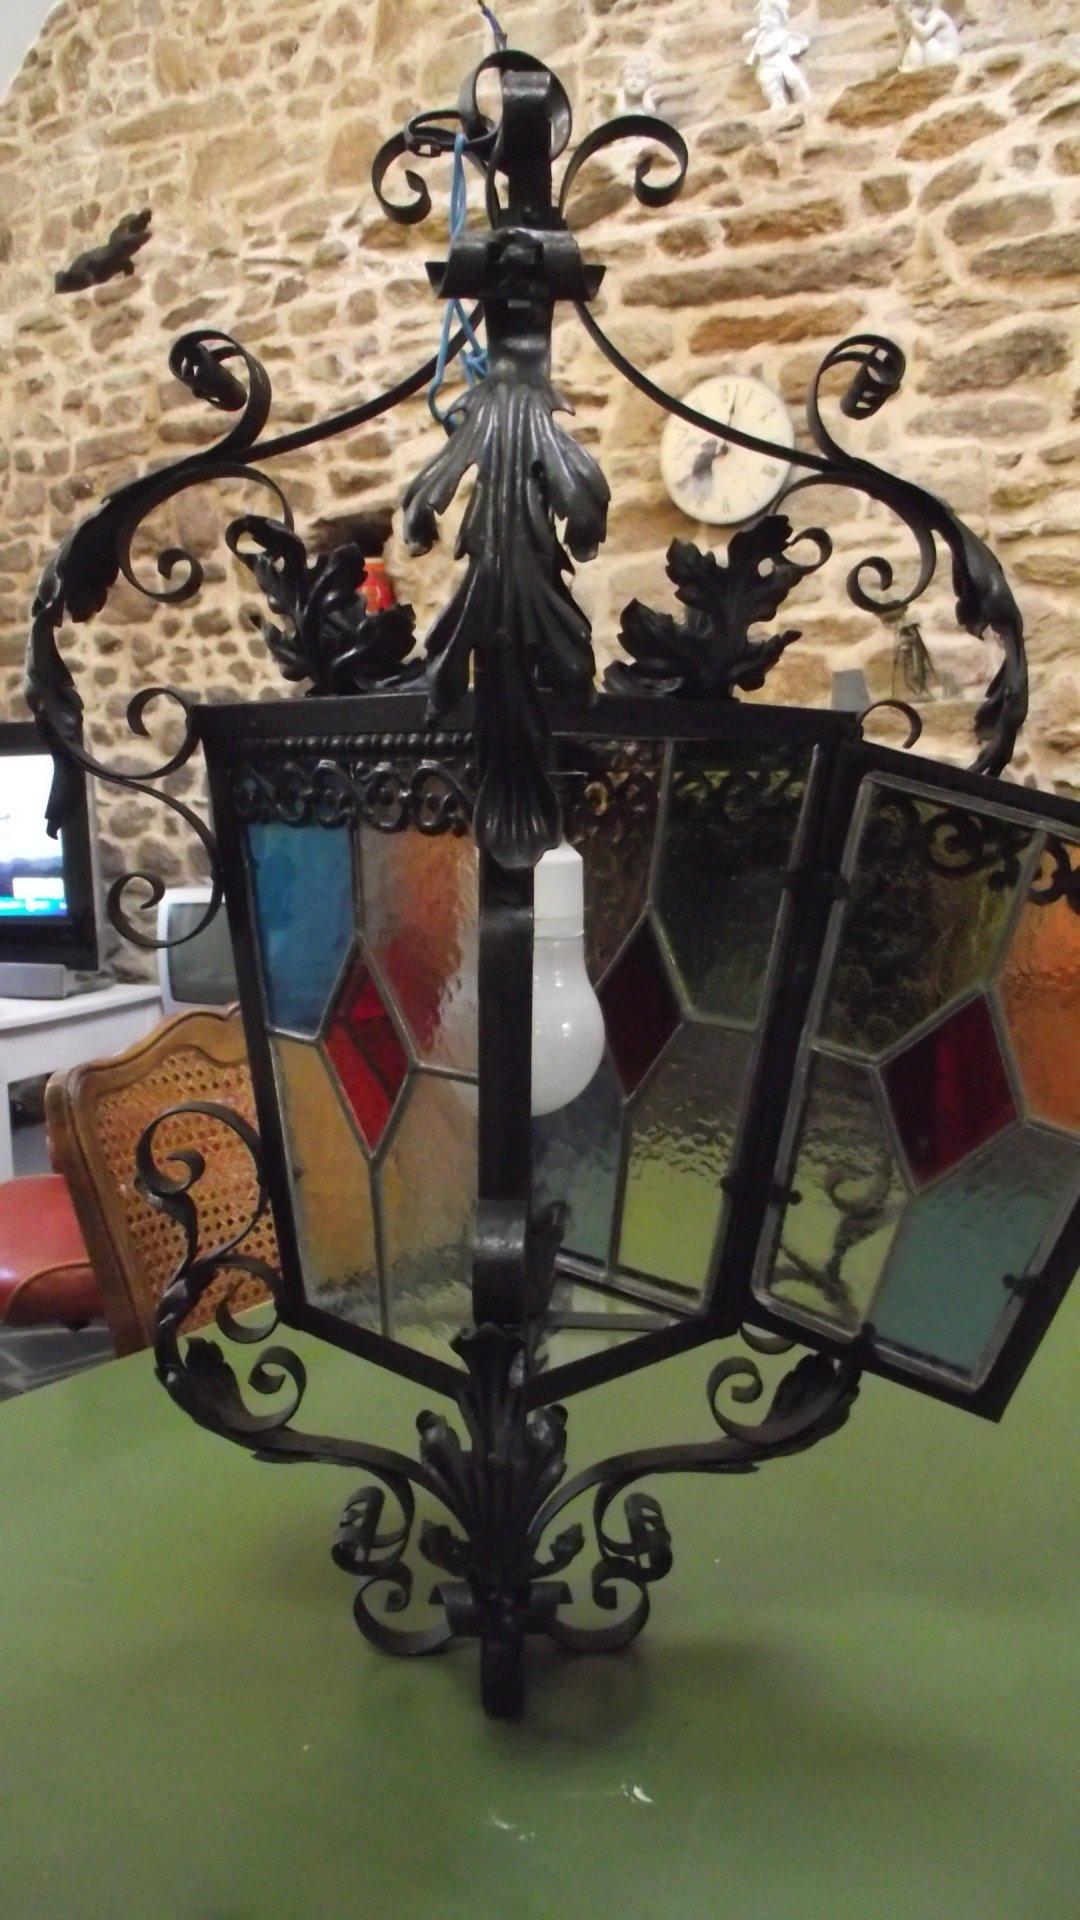 brocanamau lanterne d entr e fer forg vitraux fin xix me. Black Bedroom Furniture Sets. Home Design Ideas